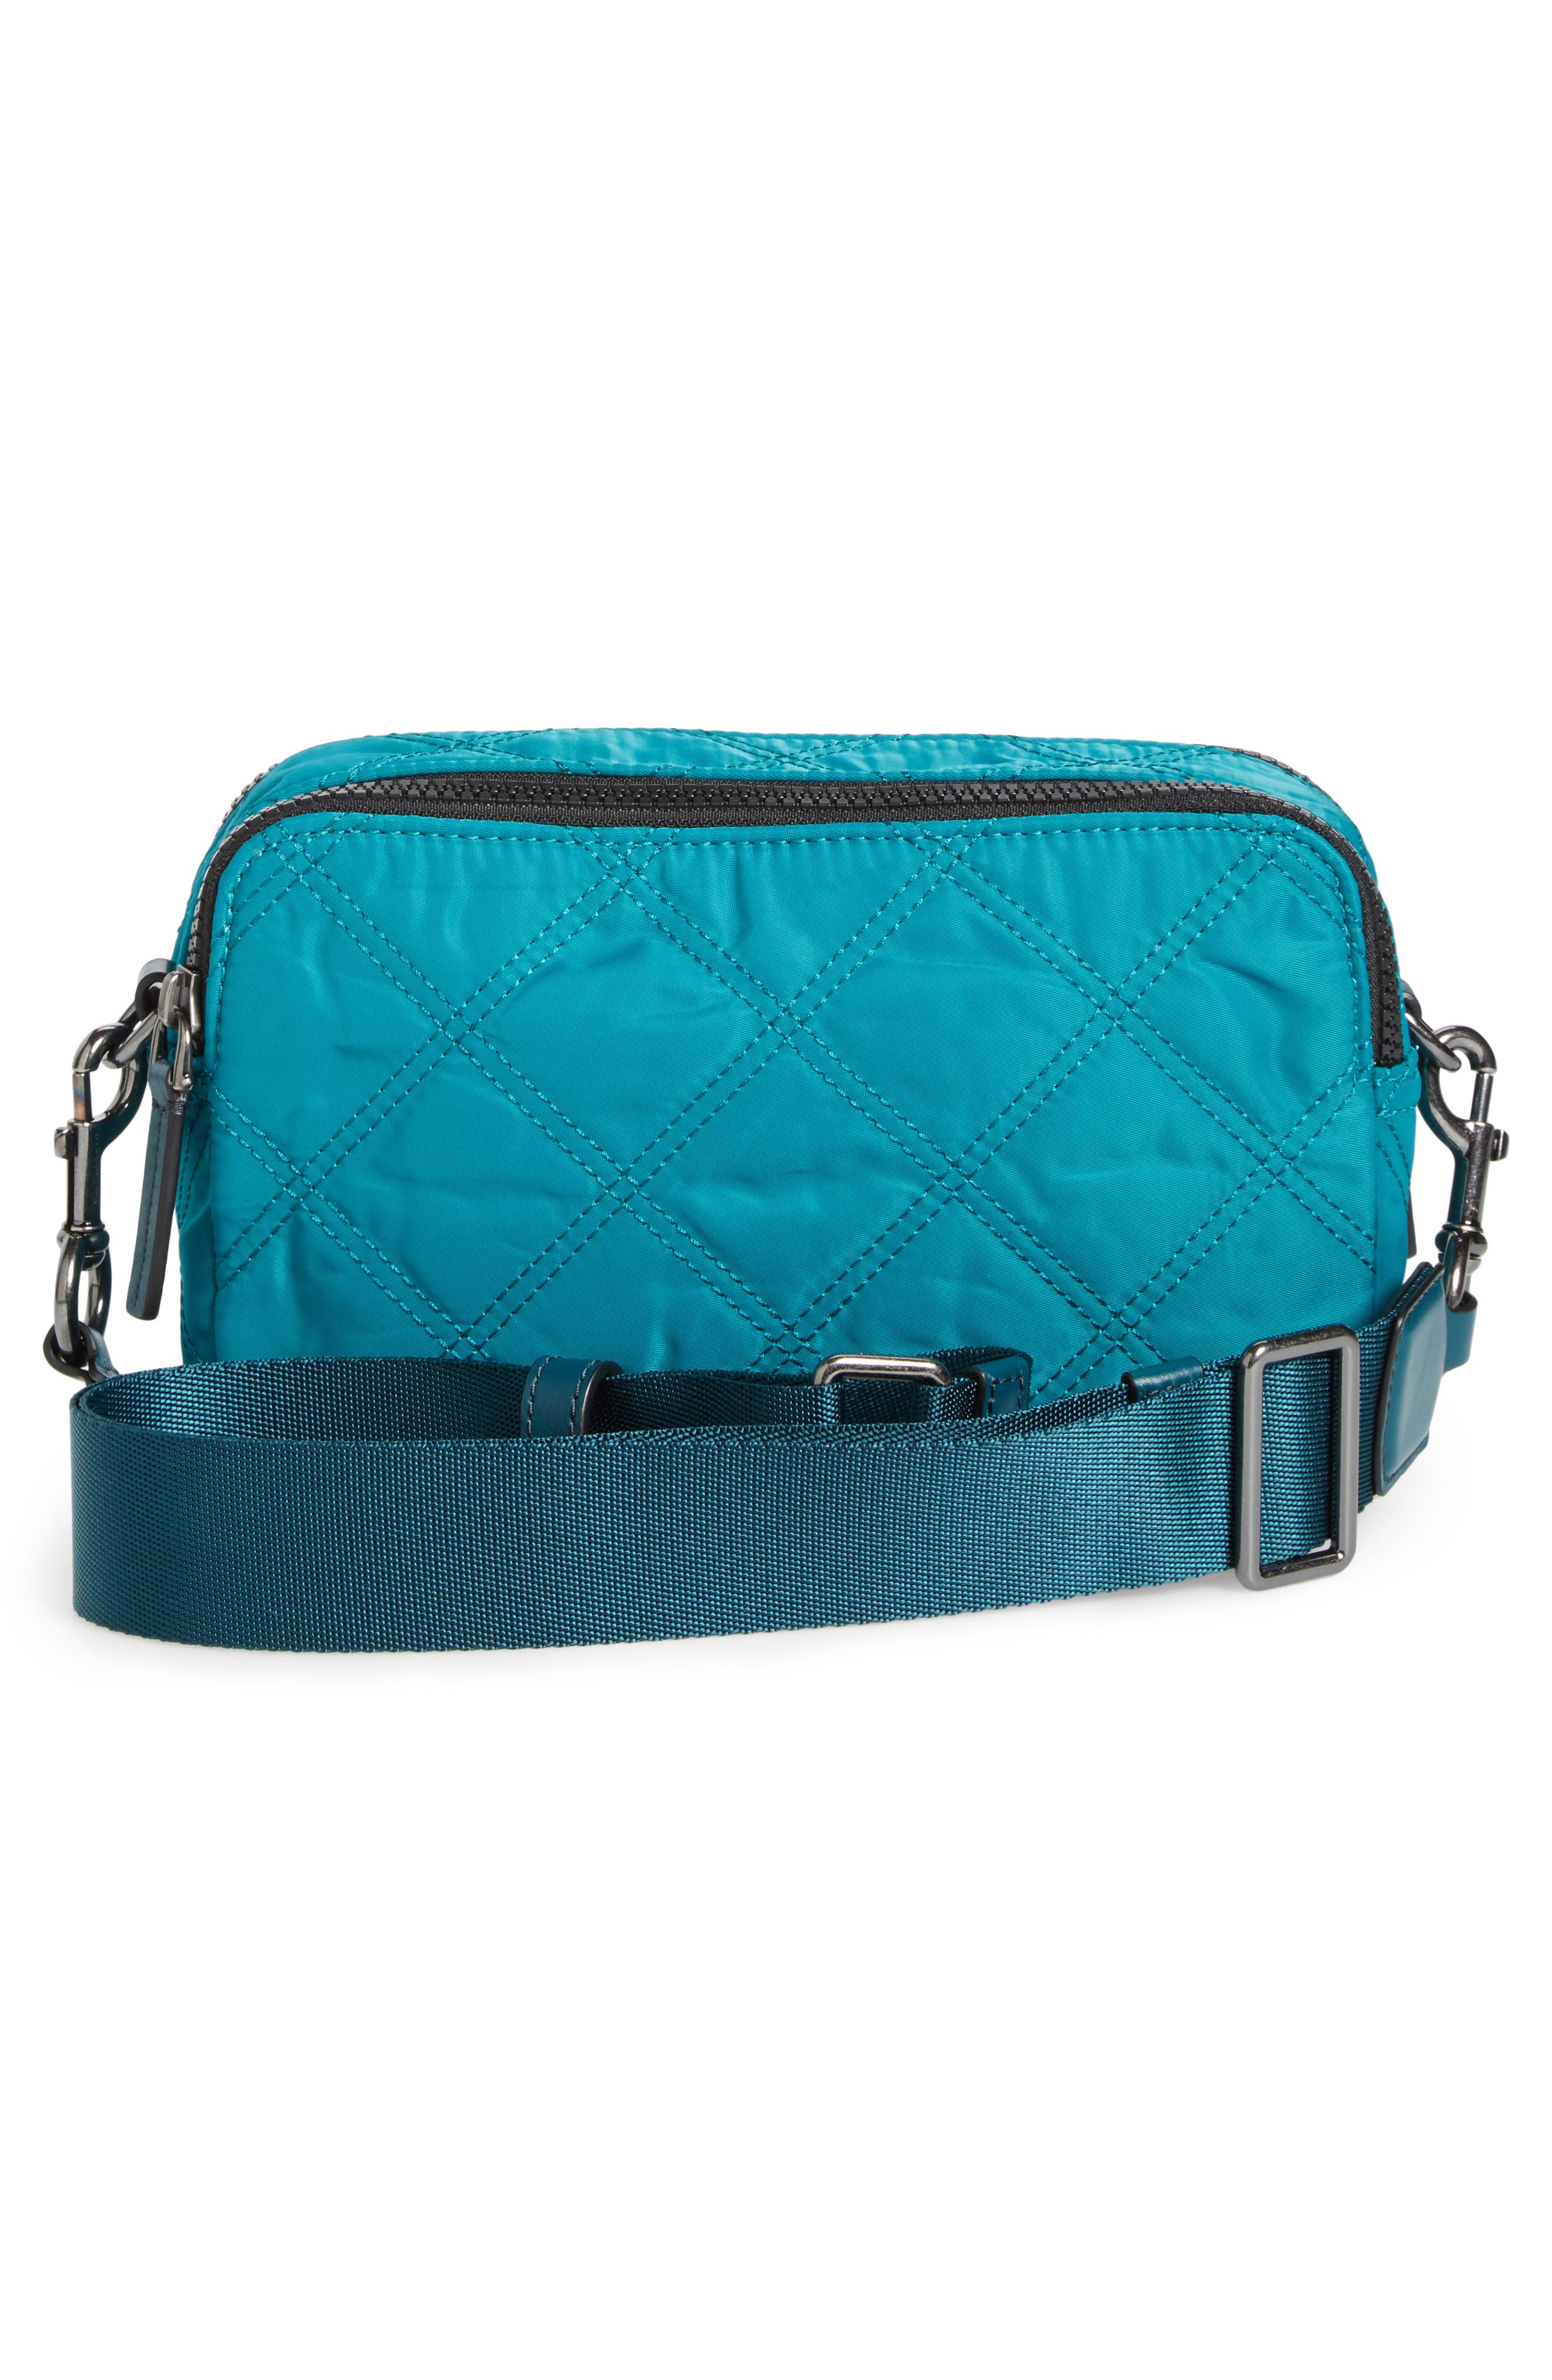 Nylon Knot Crossbody Bag,                             Alternate thumbnail 8, color,